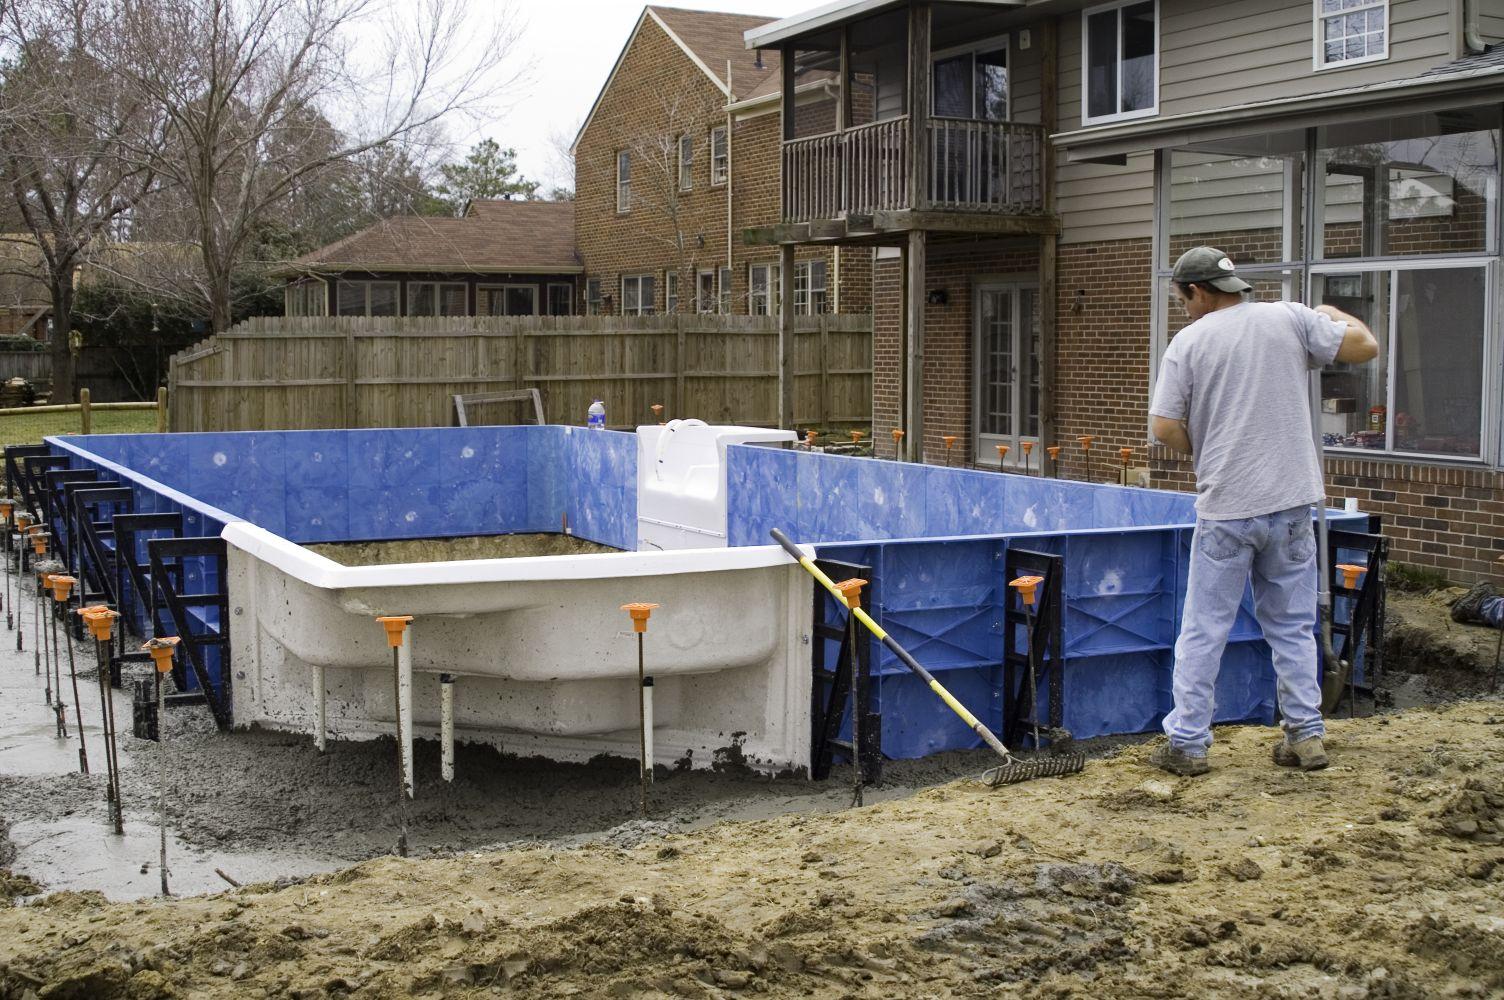 Swimming Pool Contractors, Dealers, Design